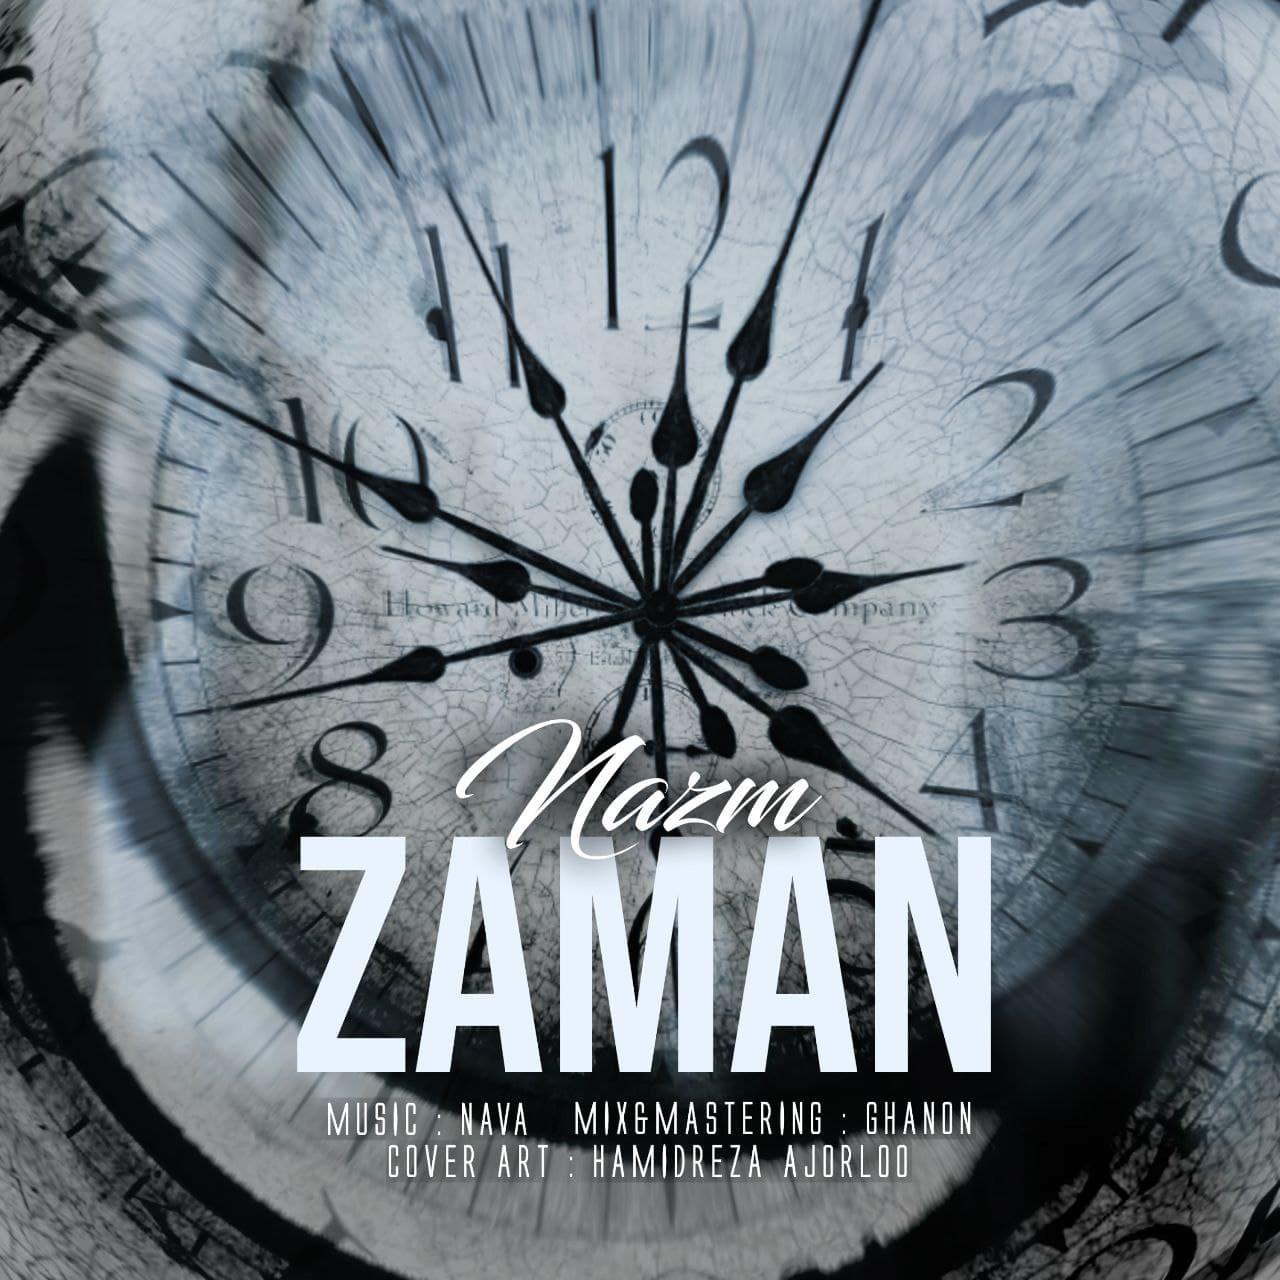 Nazm - Zaman